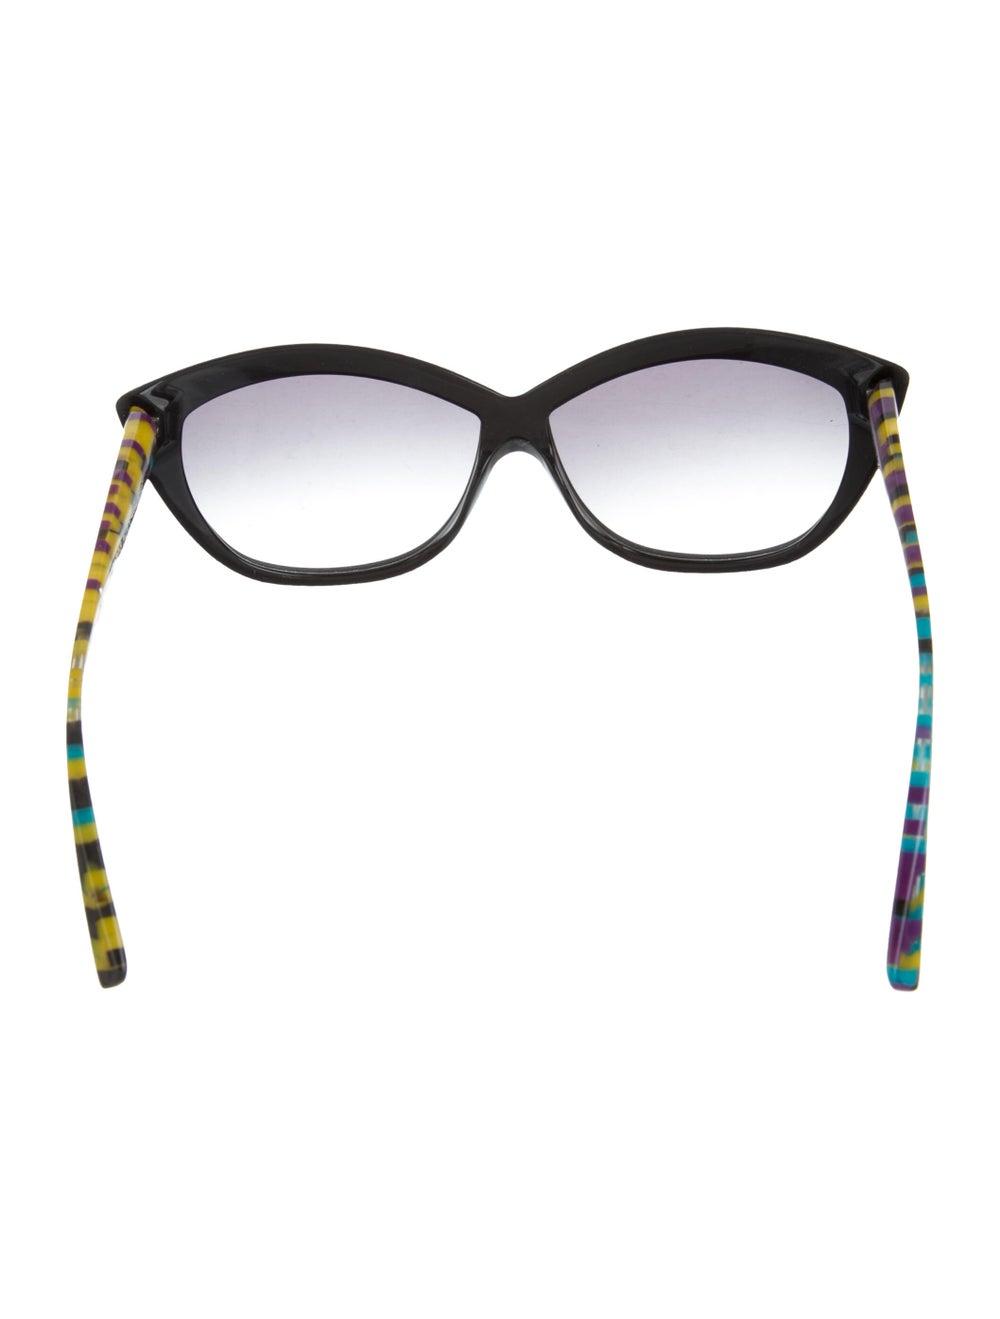 Alain Mikli Gradient Cat-Eye Sunglasses Black - image 3